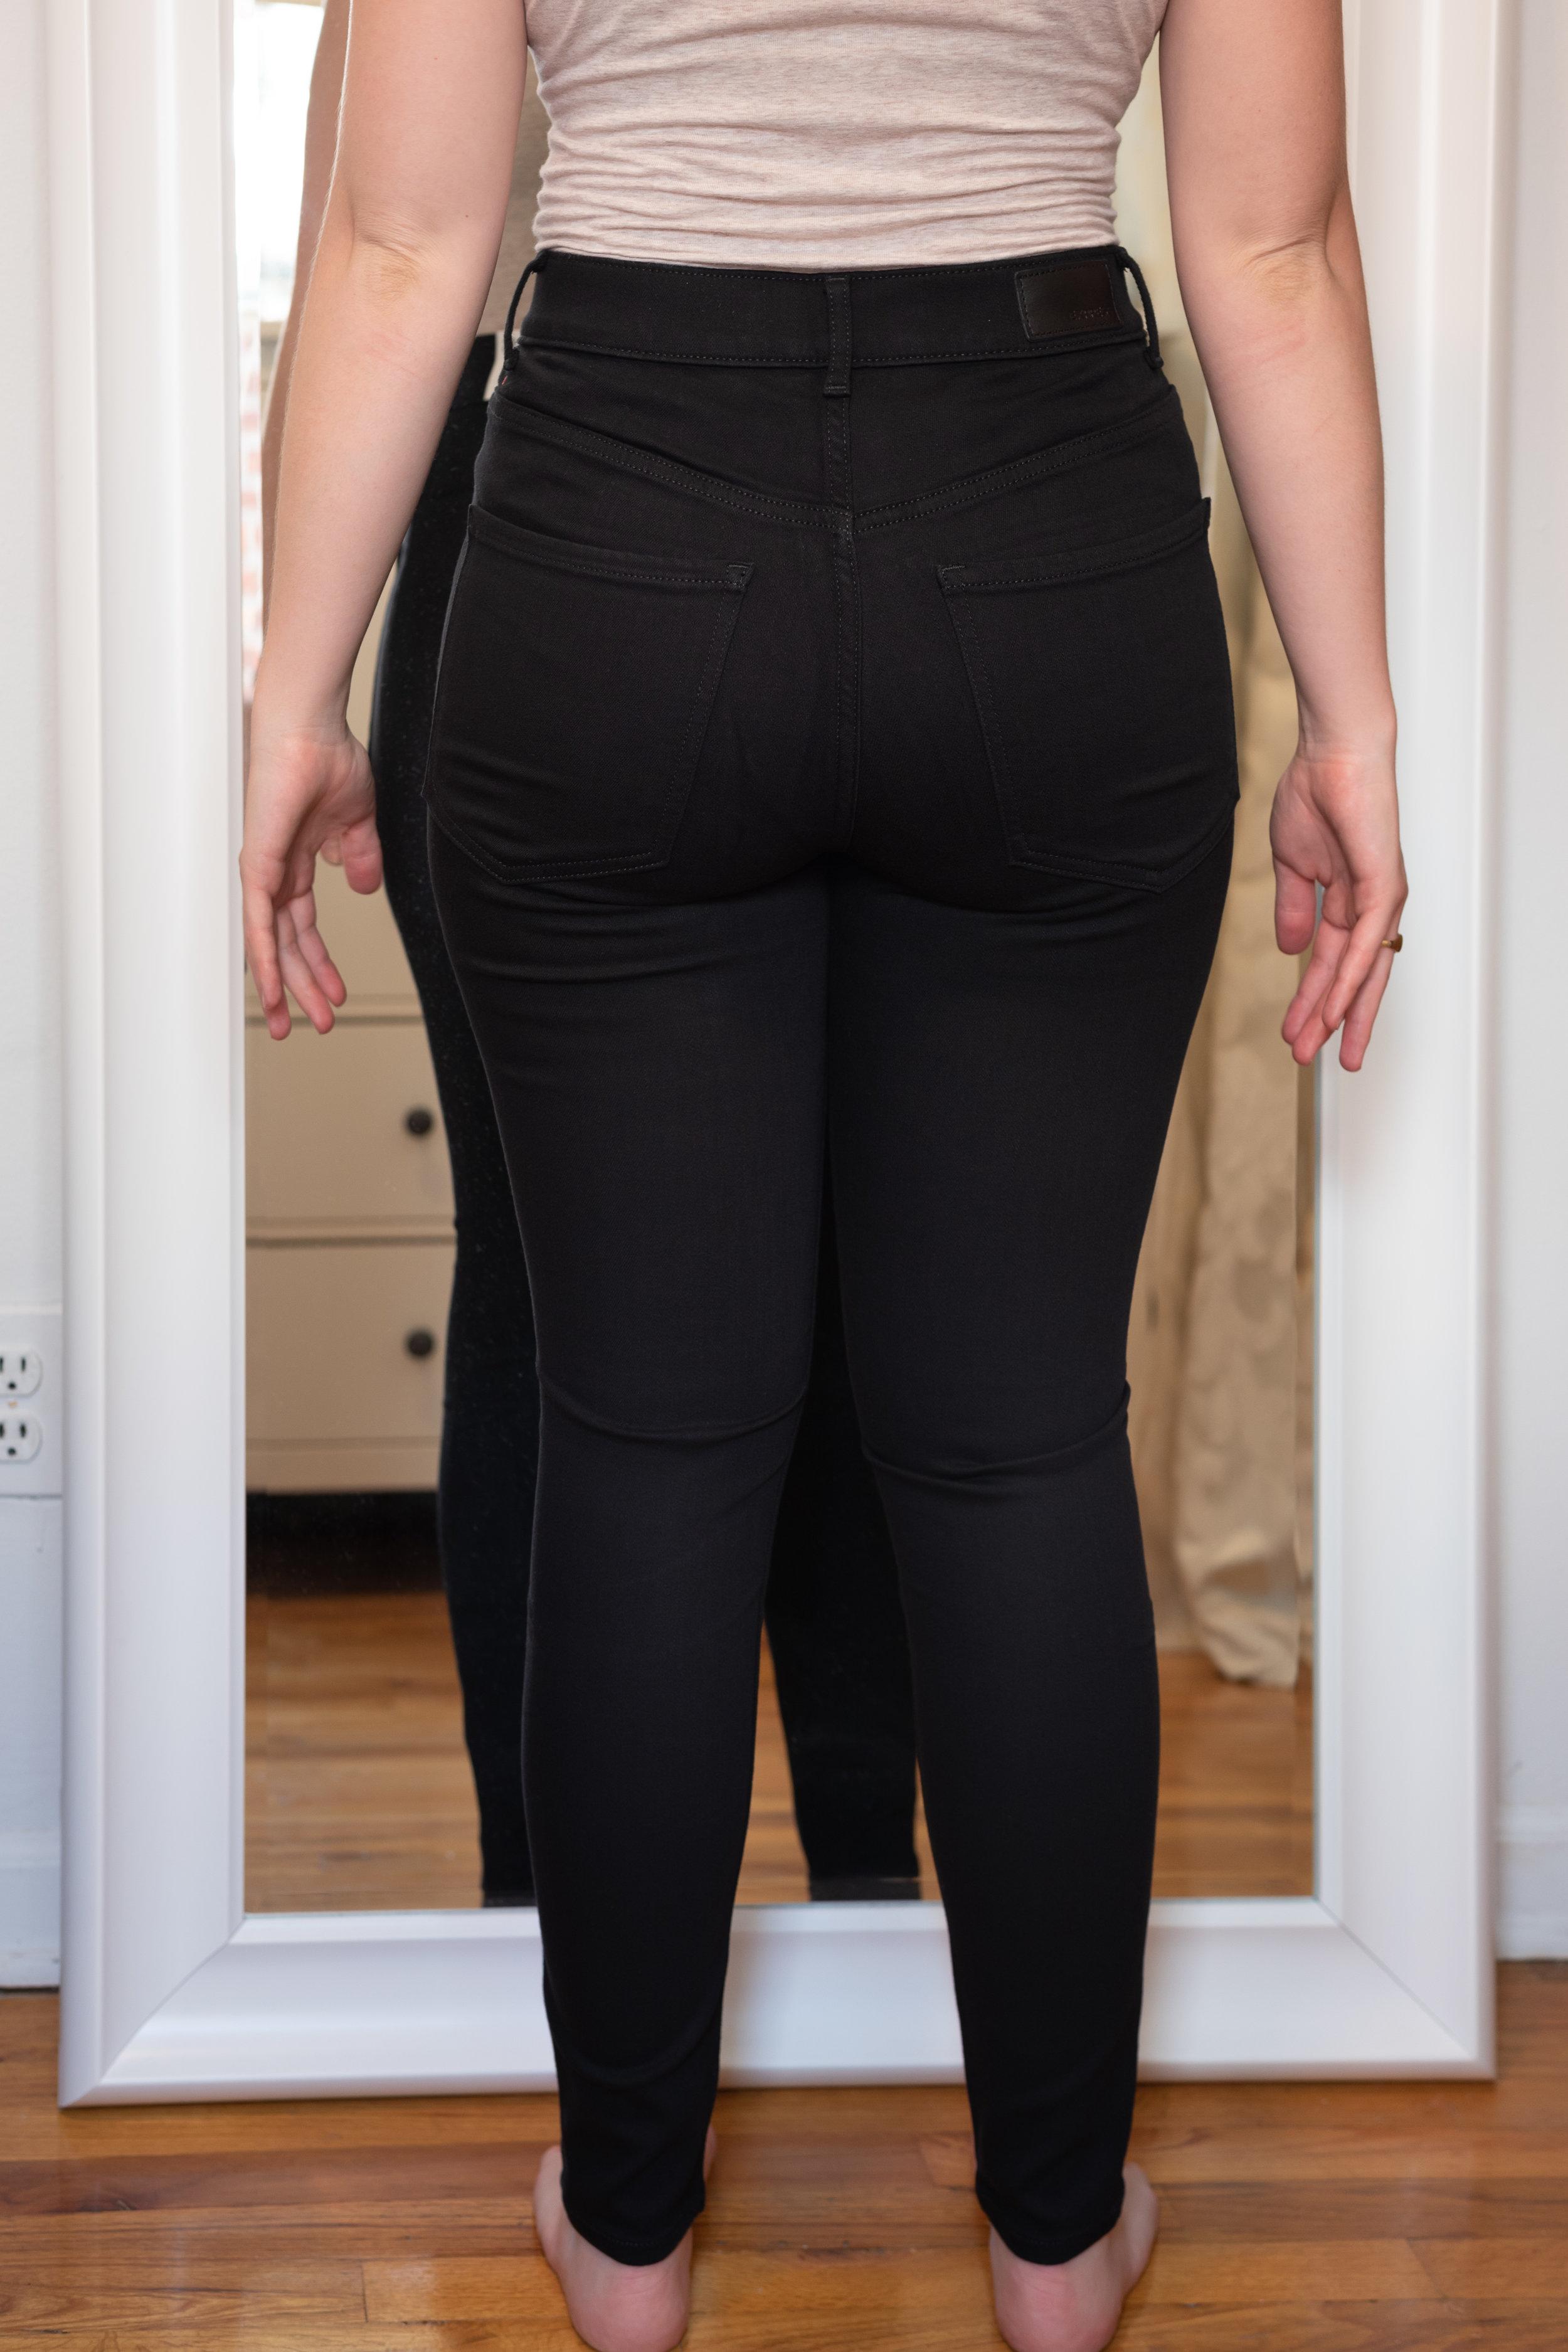 Express Super High Waisted Black Legging - Size 6 Short